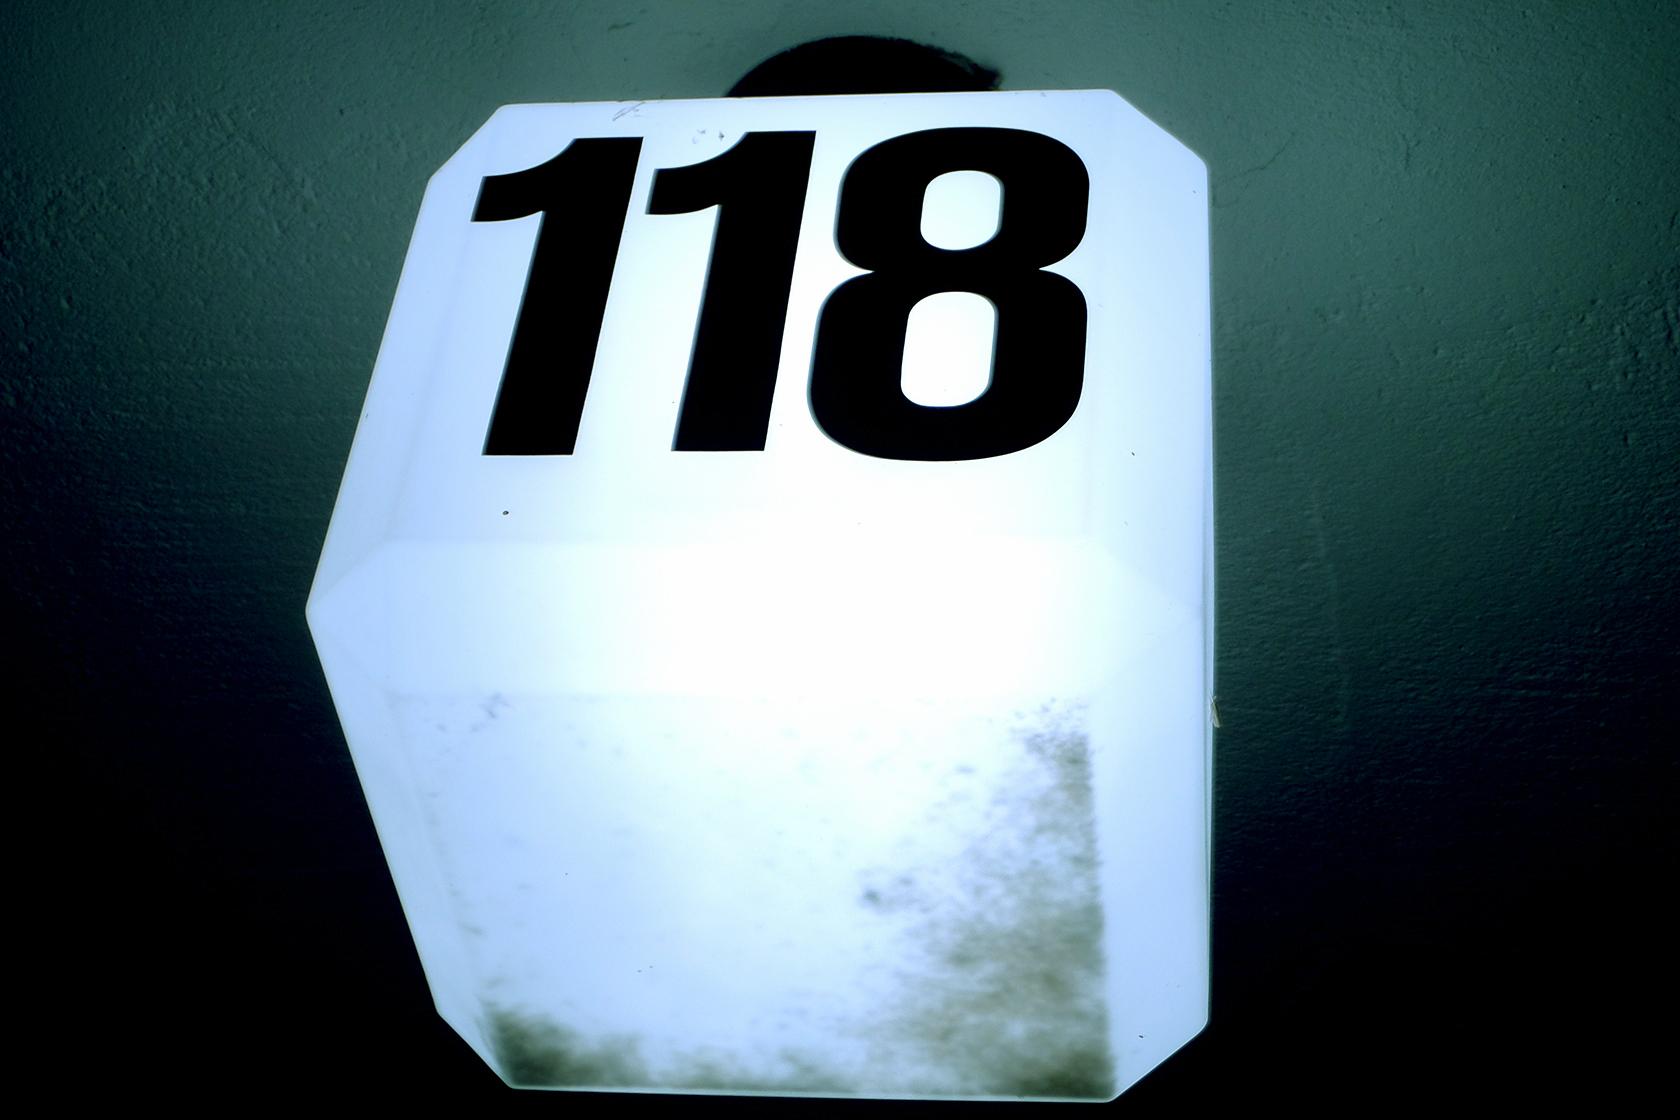 Az 39 J 392/11.BLN 2014